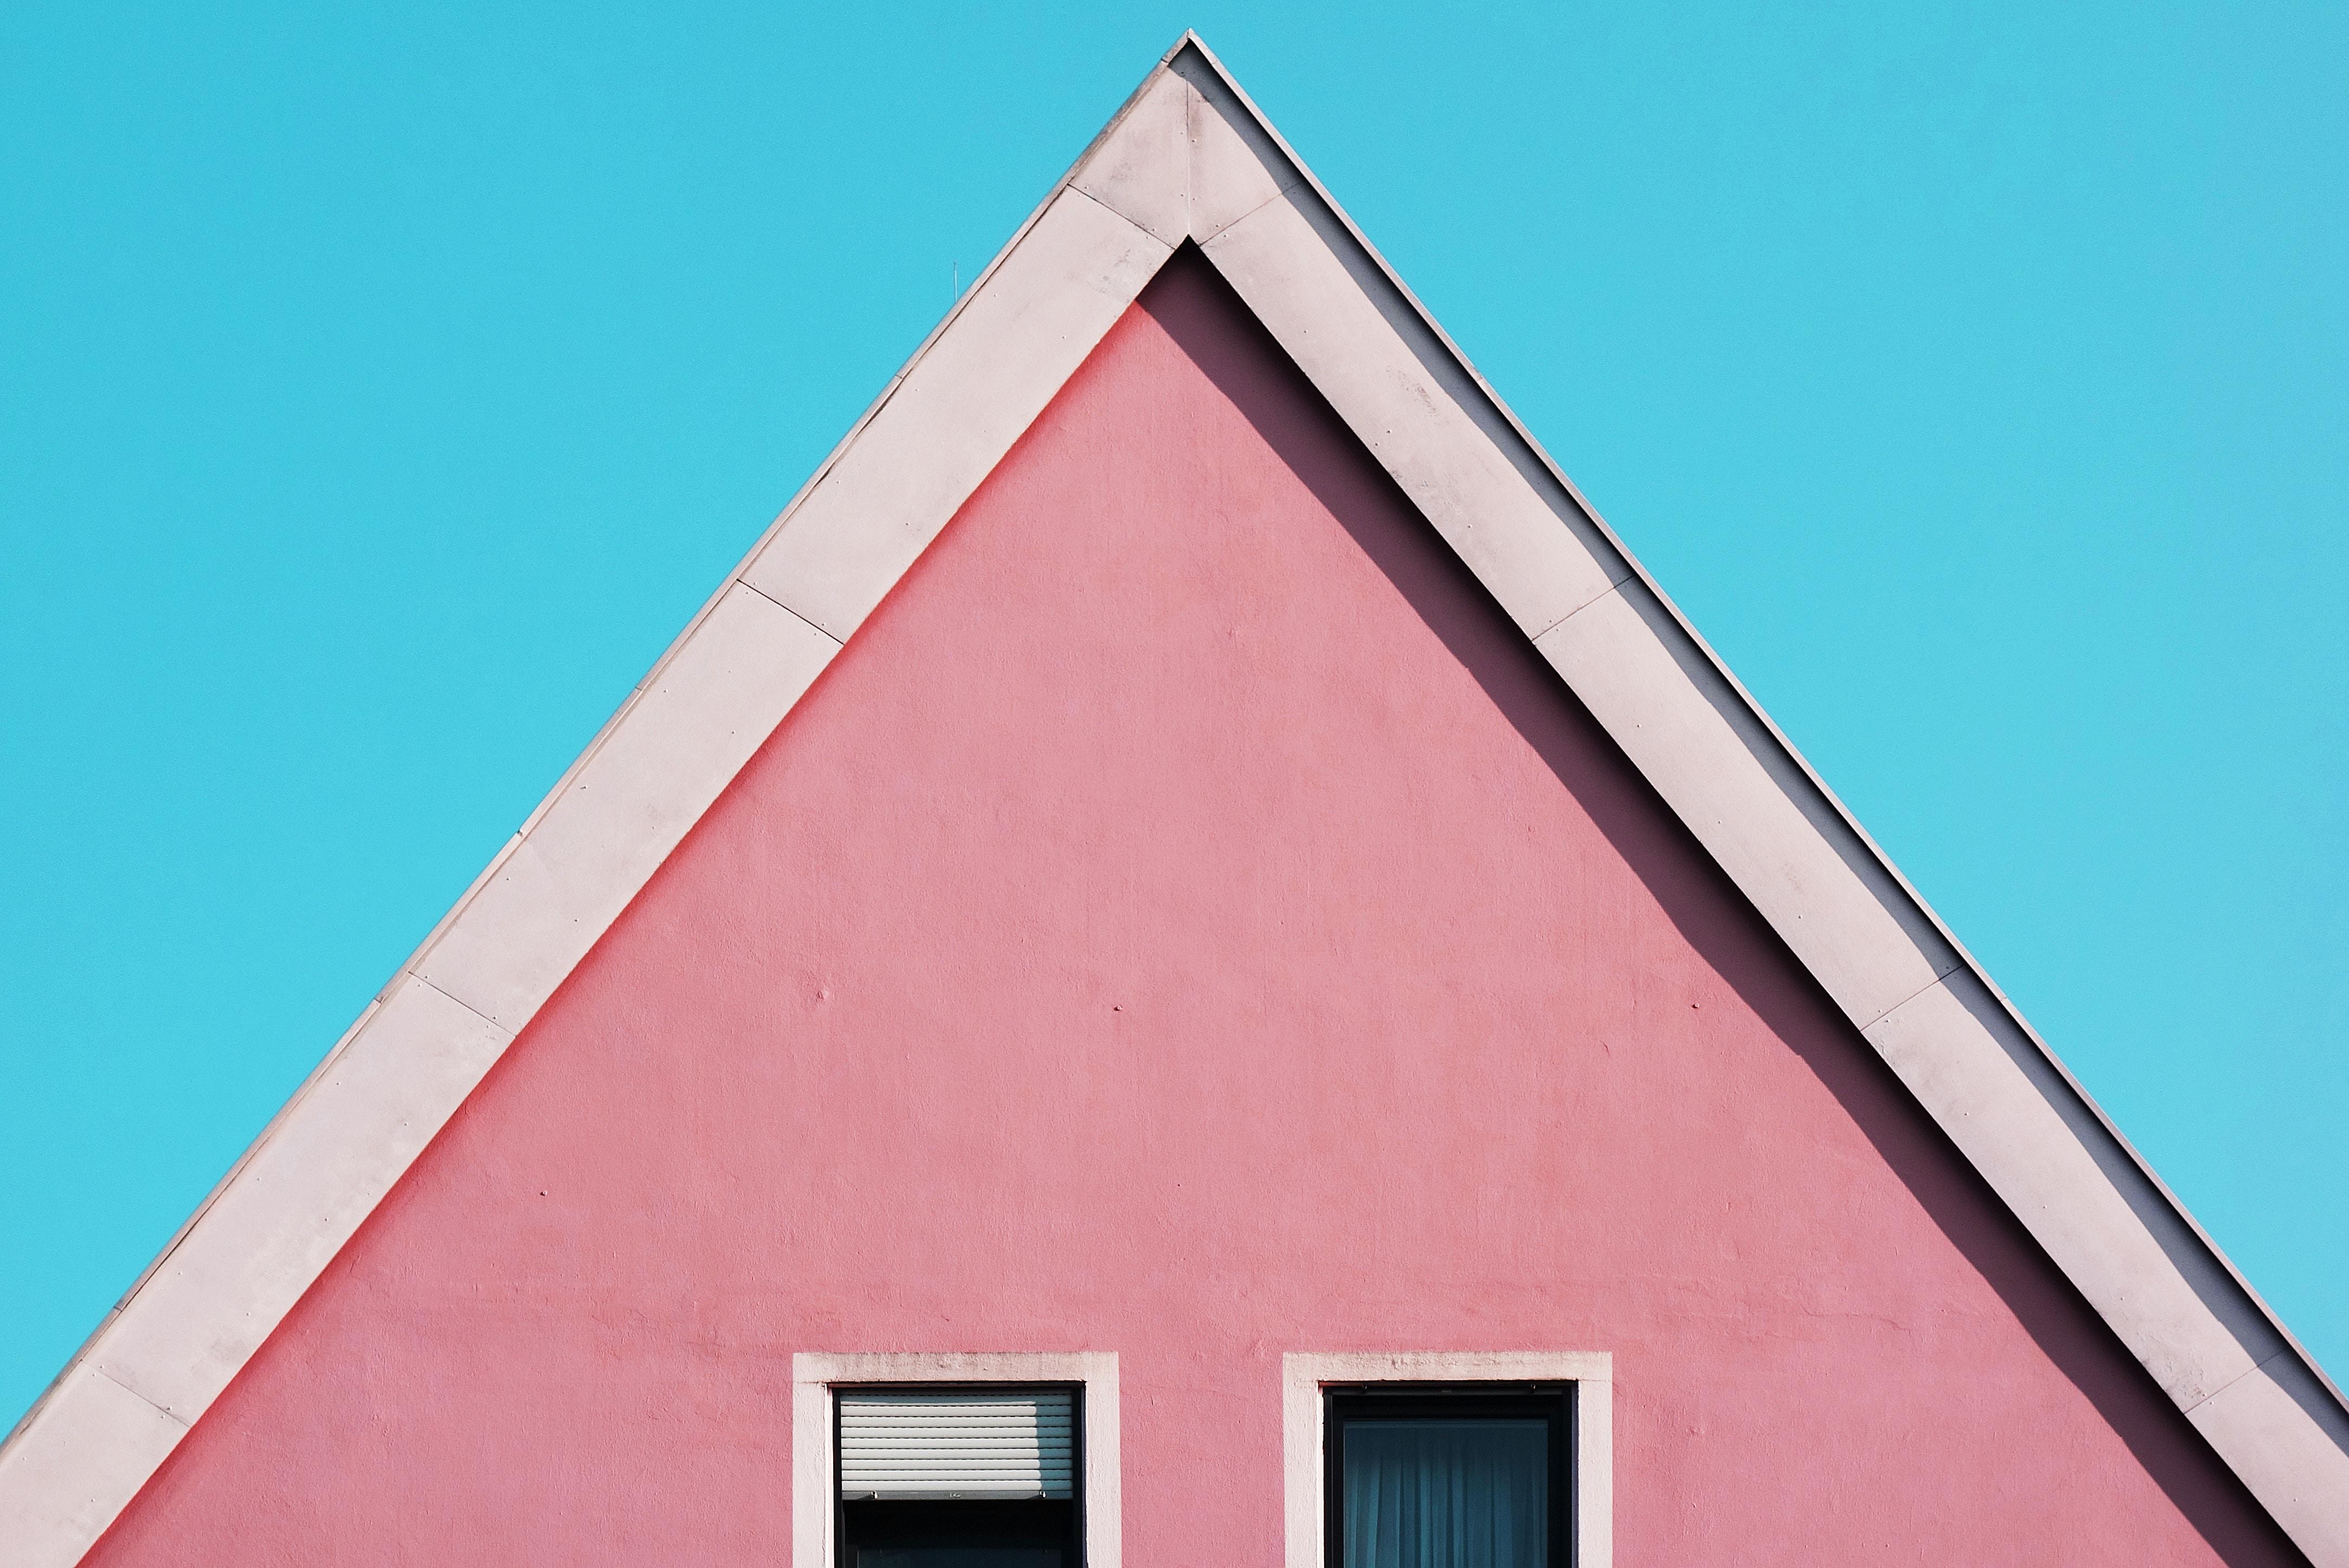 pinkhousetop